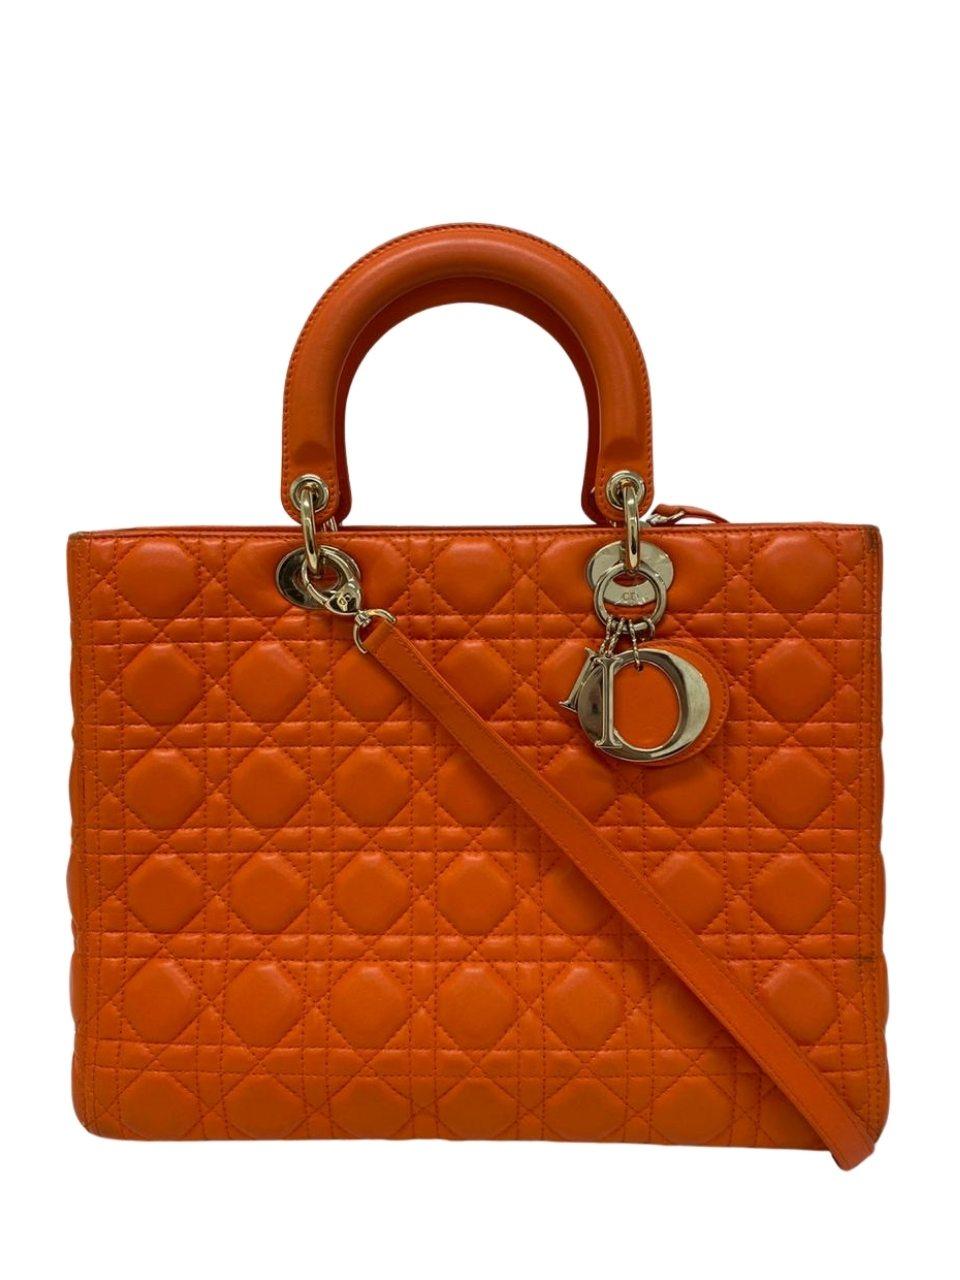 Bolsa Lady Dior Laranja